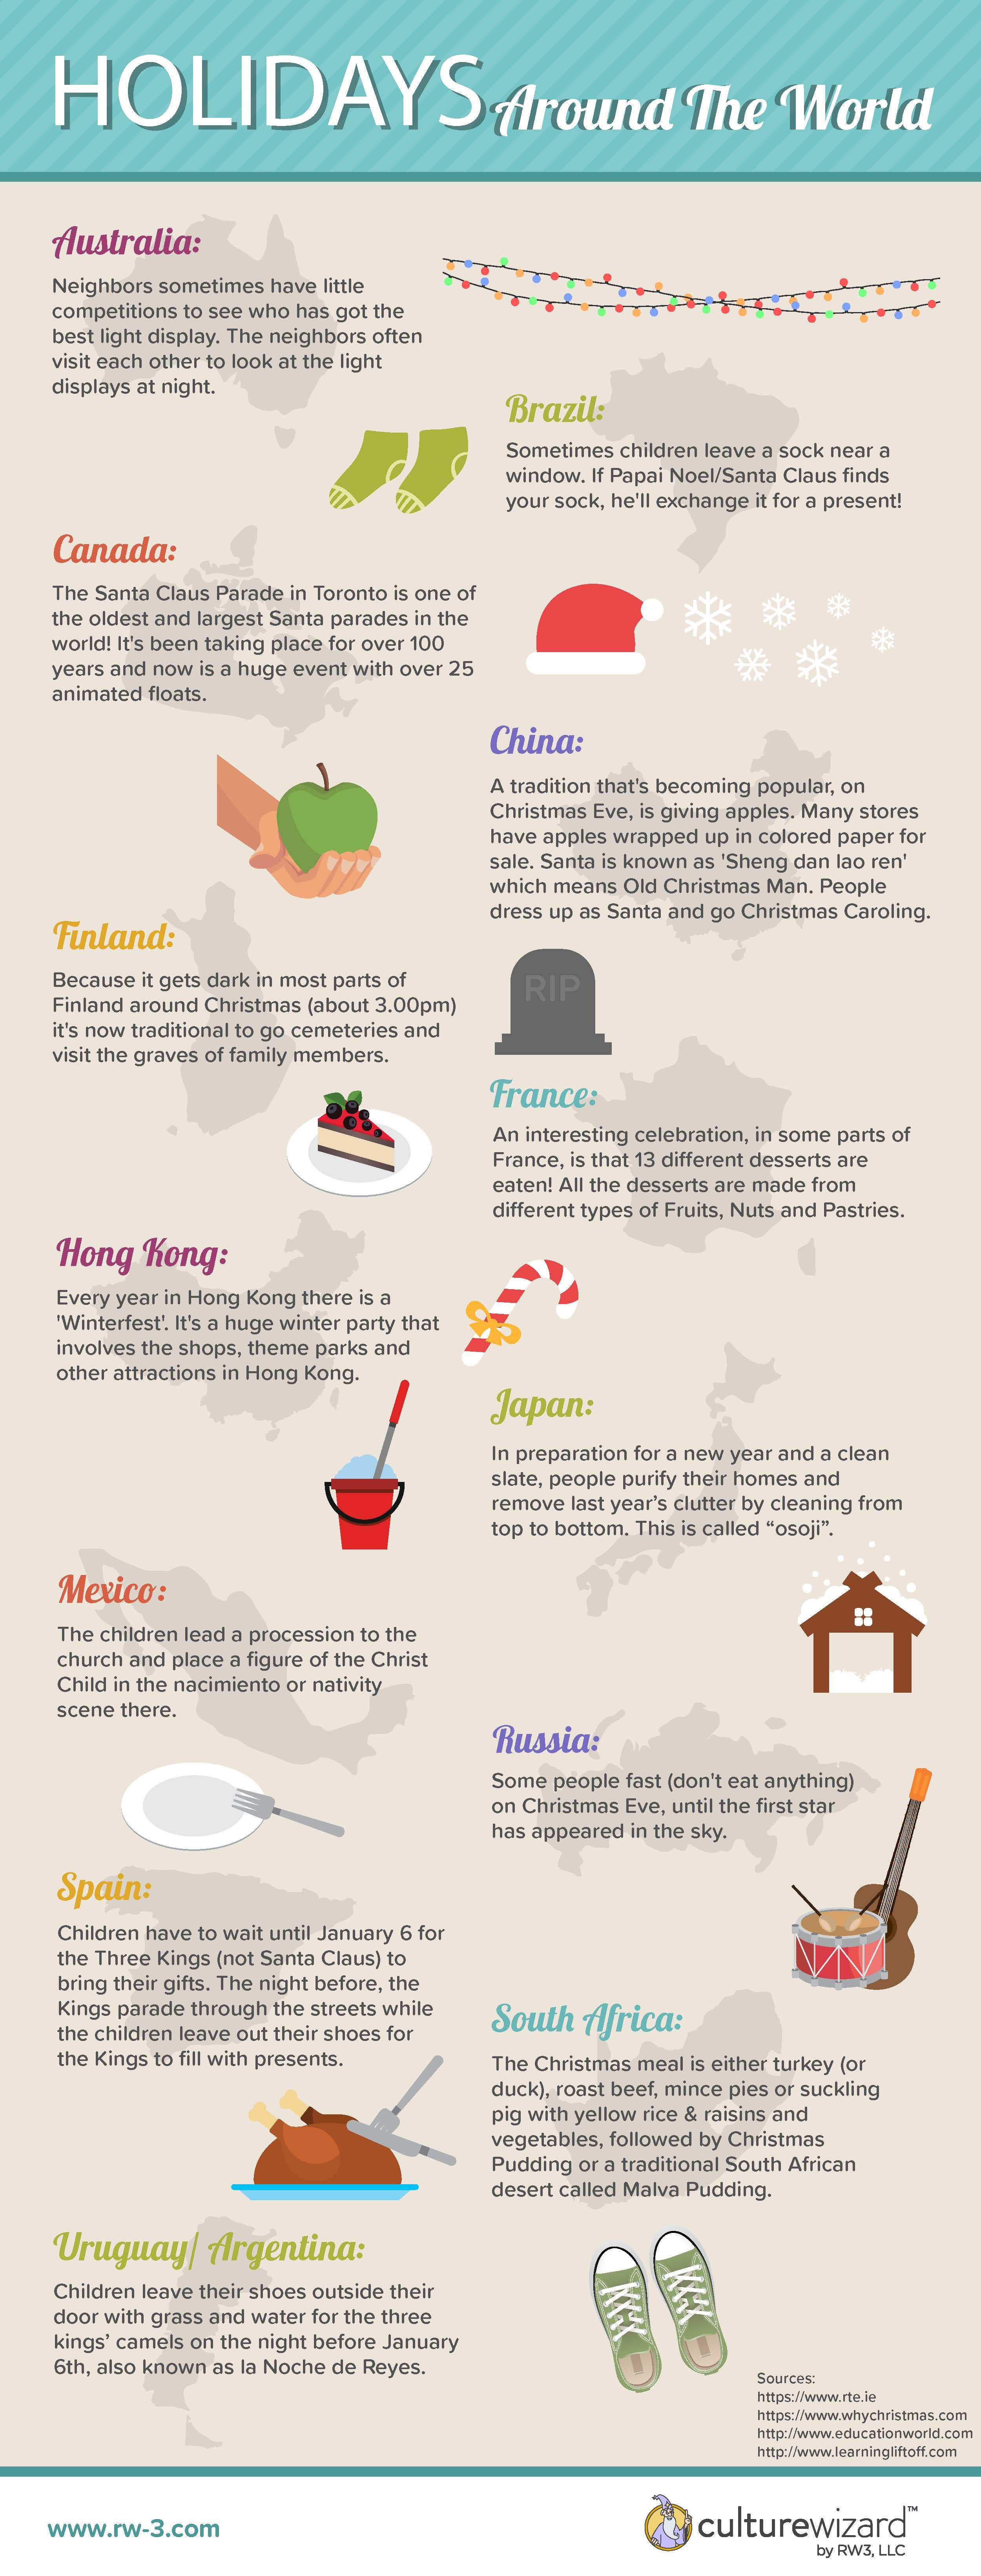 RW3 - Holidays Around the World Infographic-1.jpg